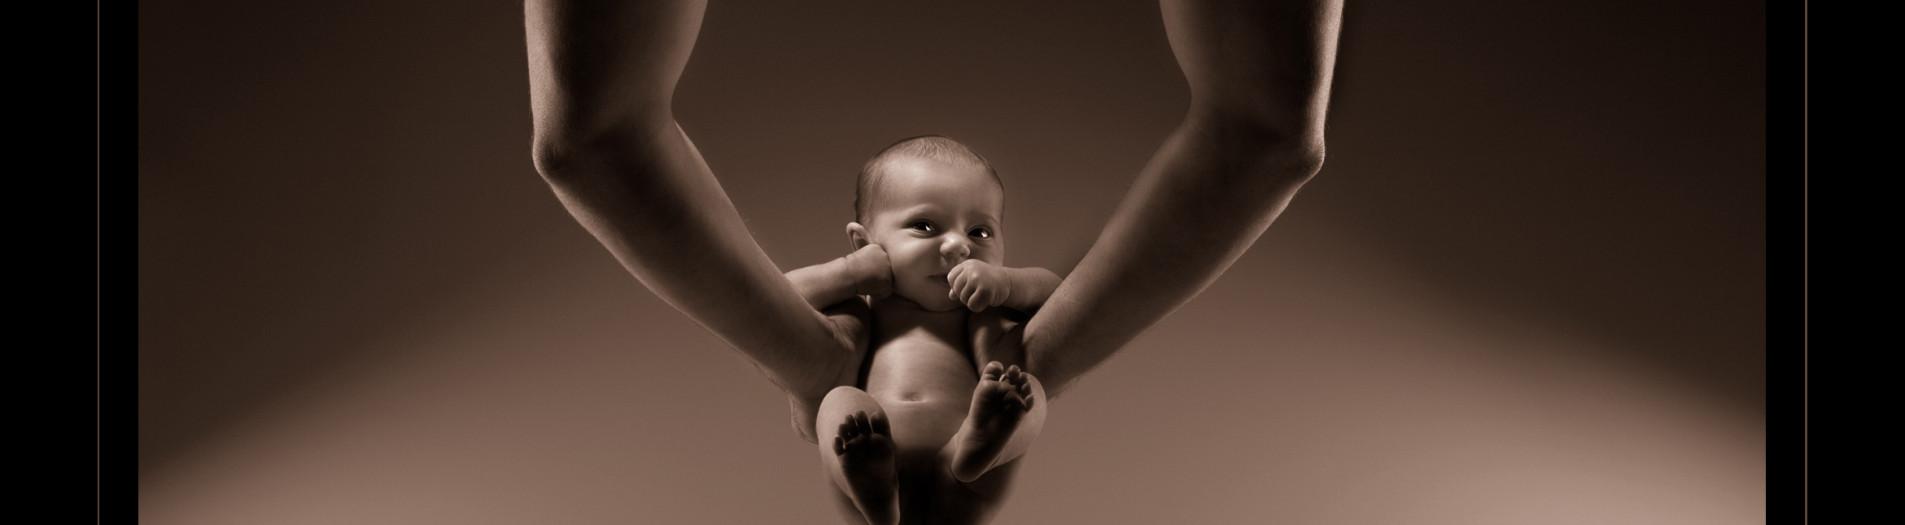 Baby Photography GOLD award